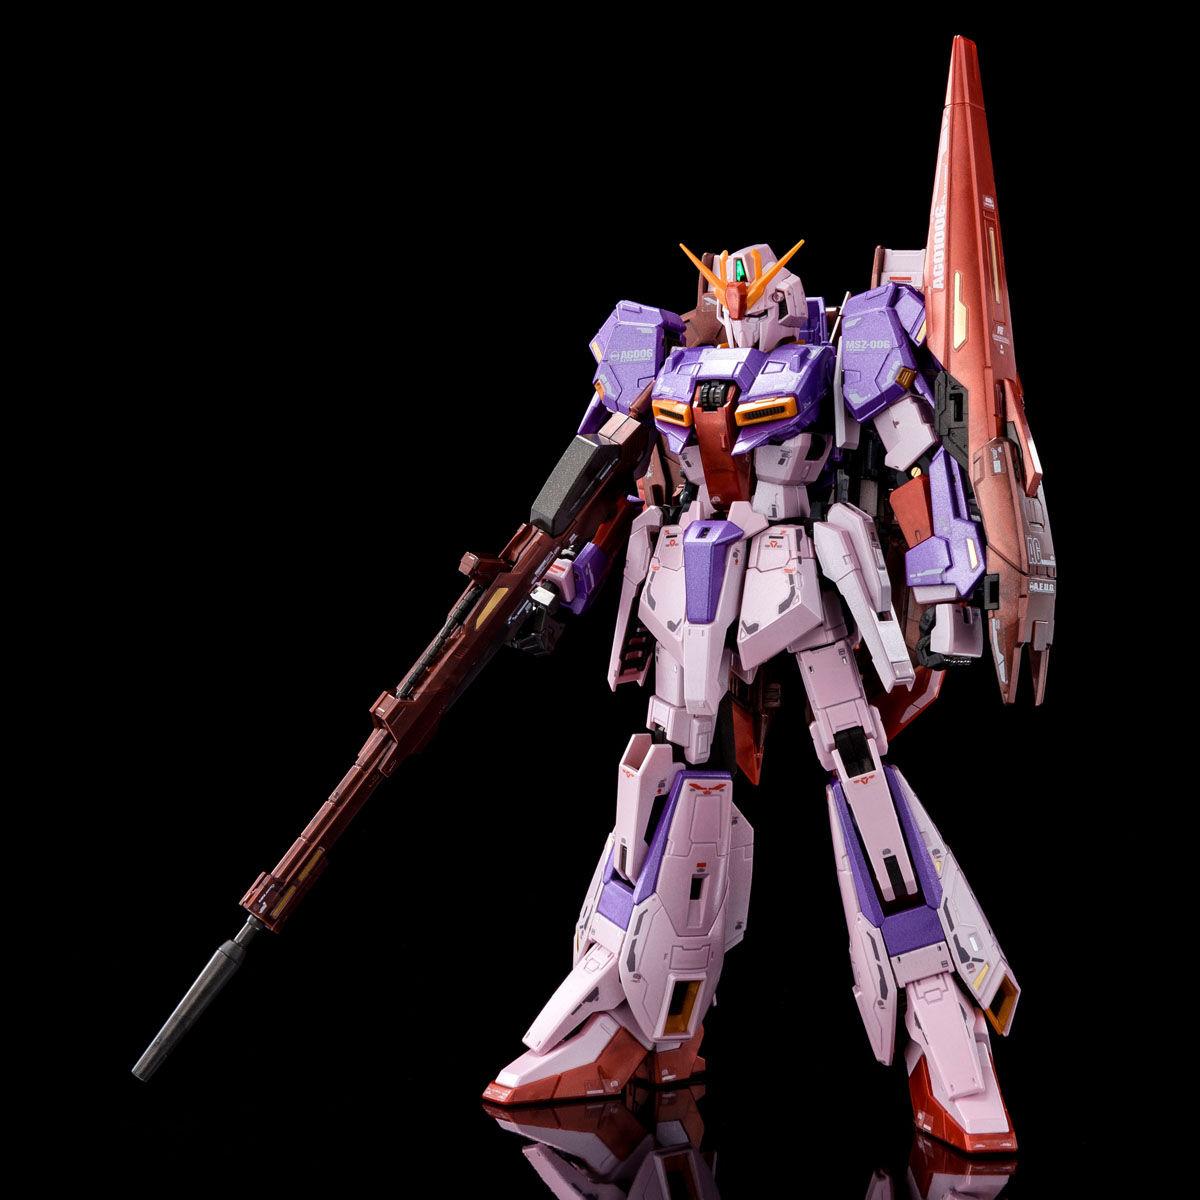 "RG 1/144 ゼータガンダム (バイオセンサーイメージカラー) [Zeta Gundam ""Biosensor Image Color""]"